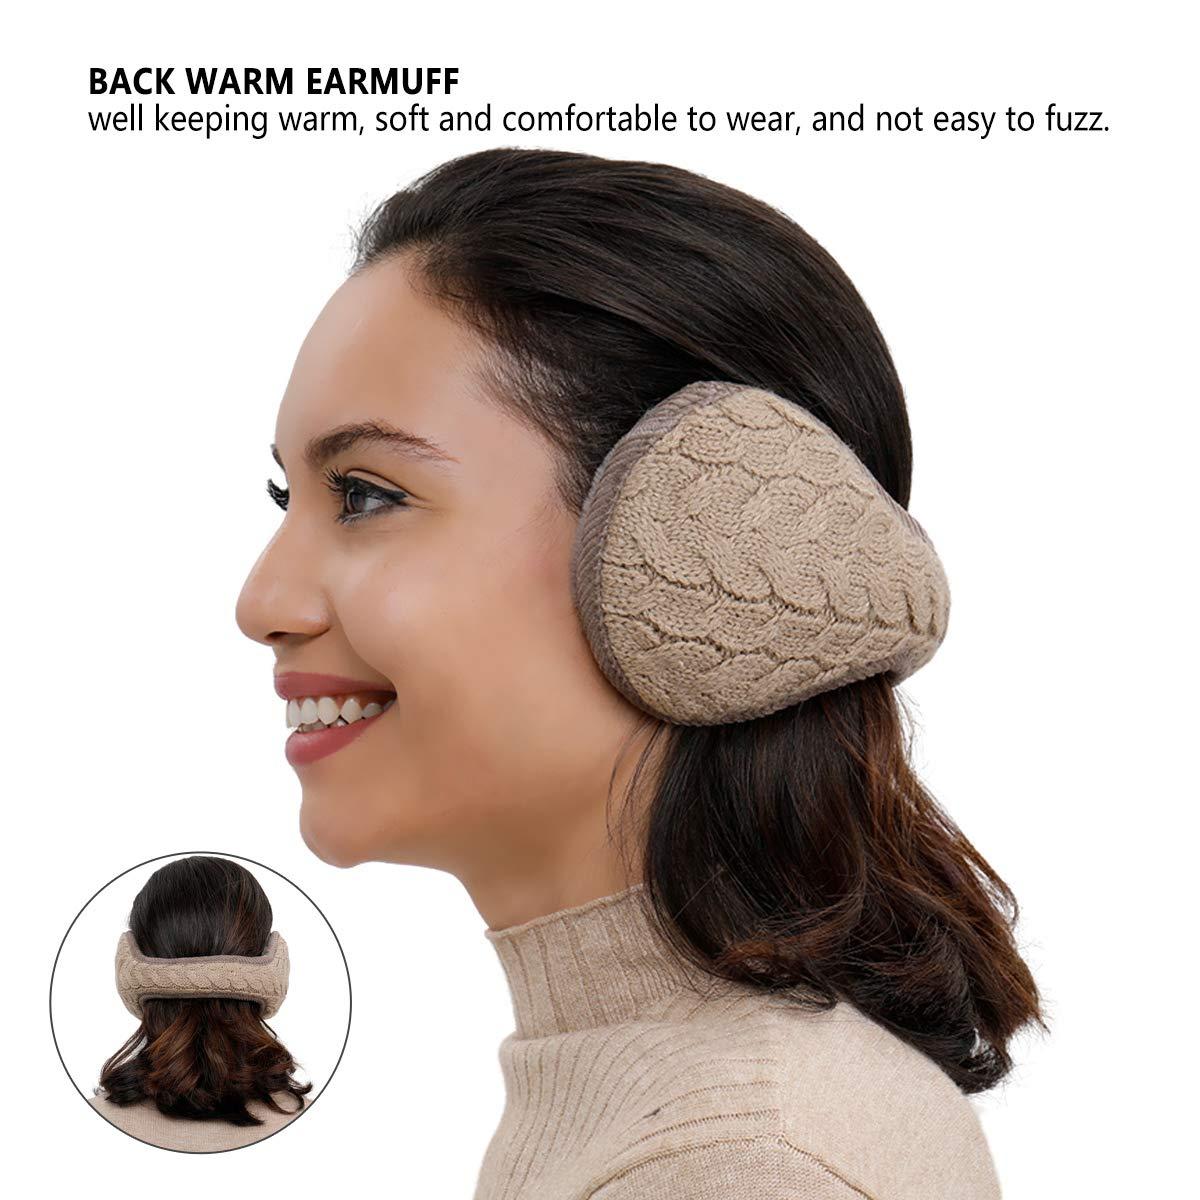 Metog Unisex Foldable Ear Warmers Polar kints Winter EarMuffs (khaki, One size) by Metog (Image #3)